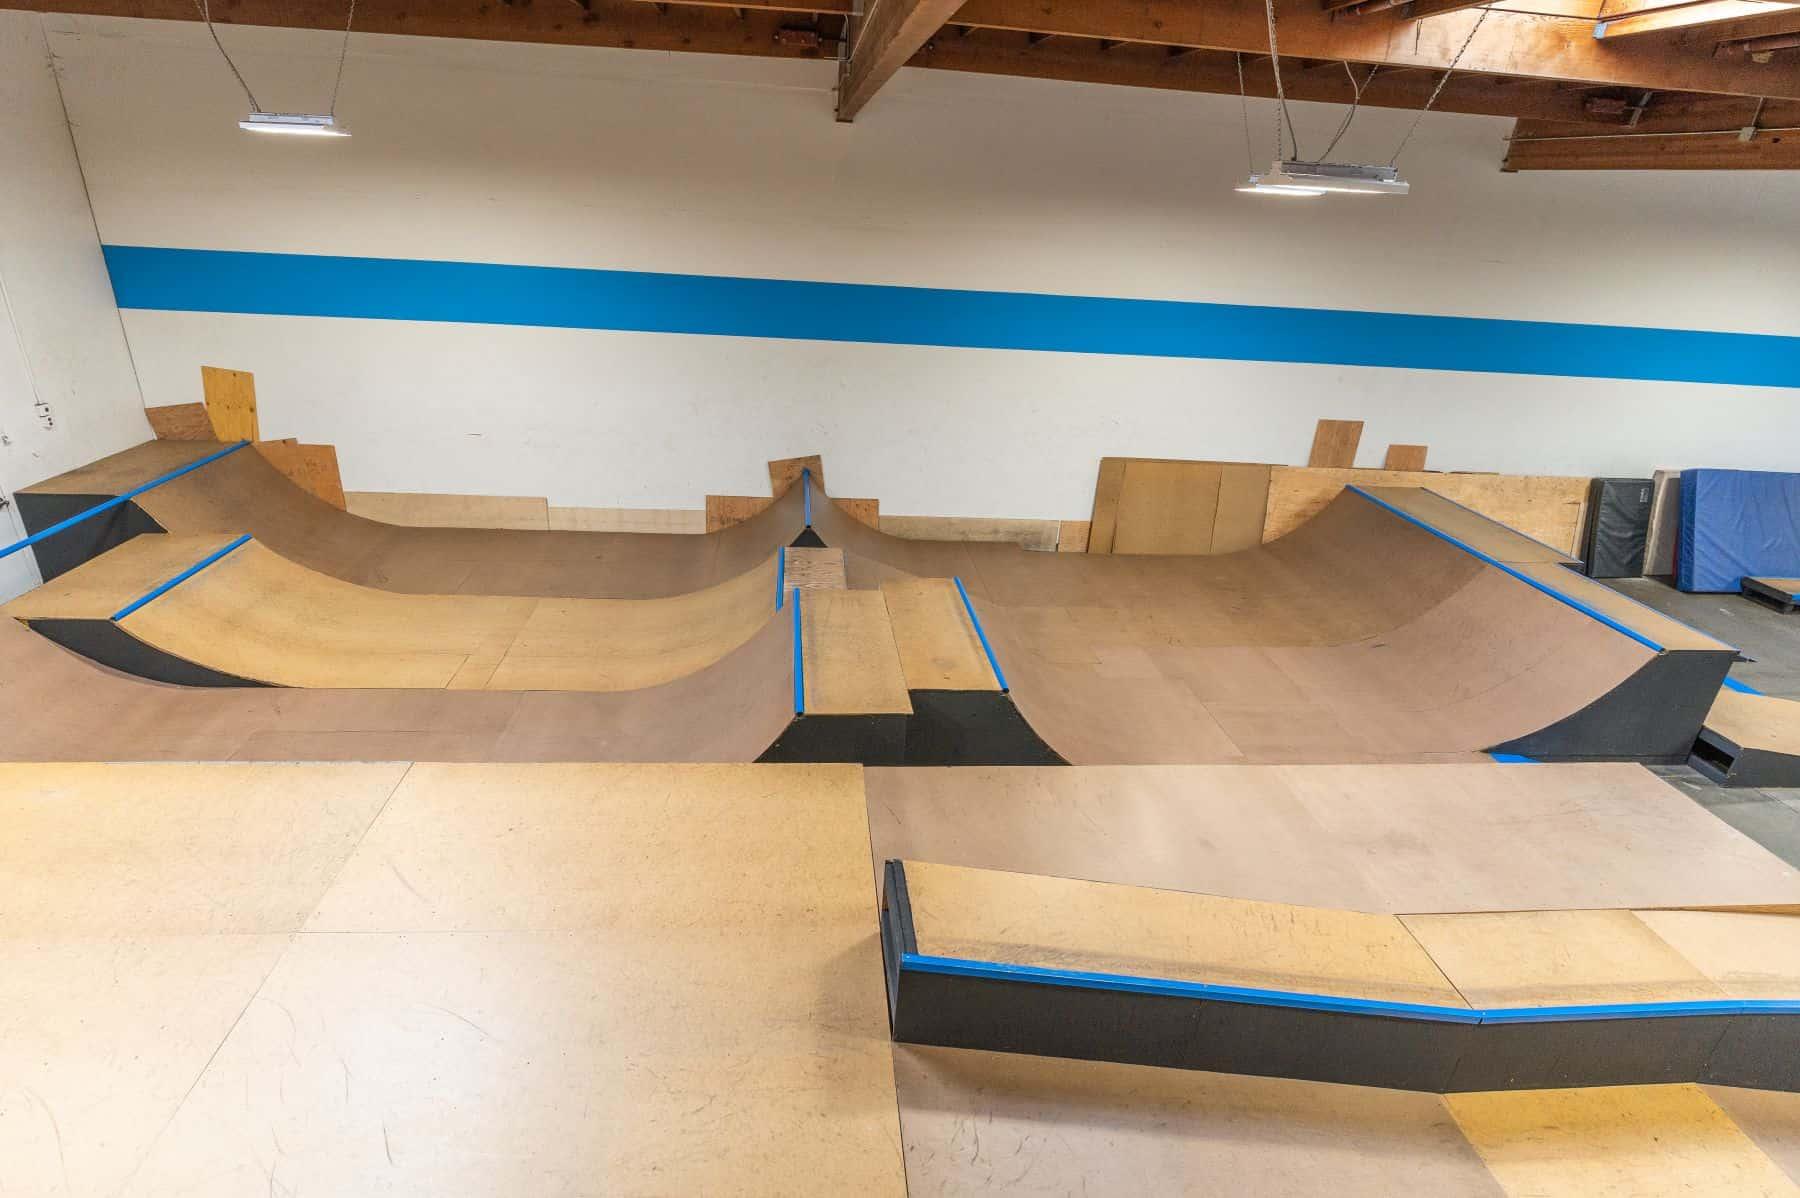 Rob Skate - San Leandro Private Skatepark 21